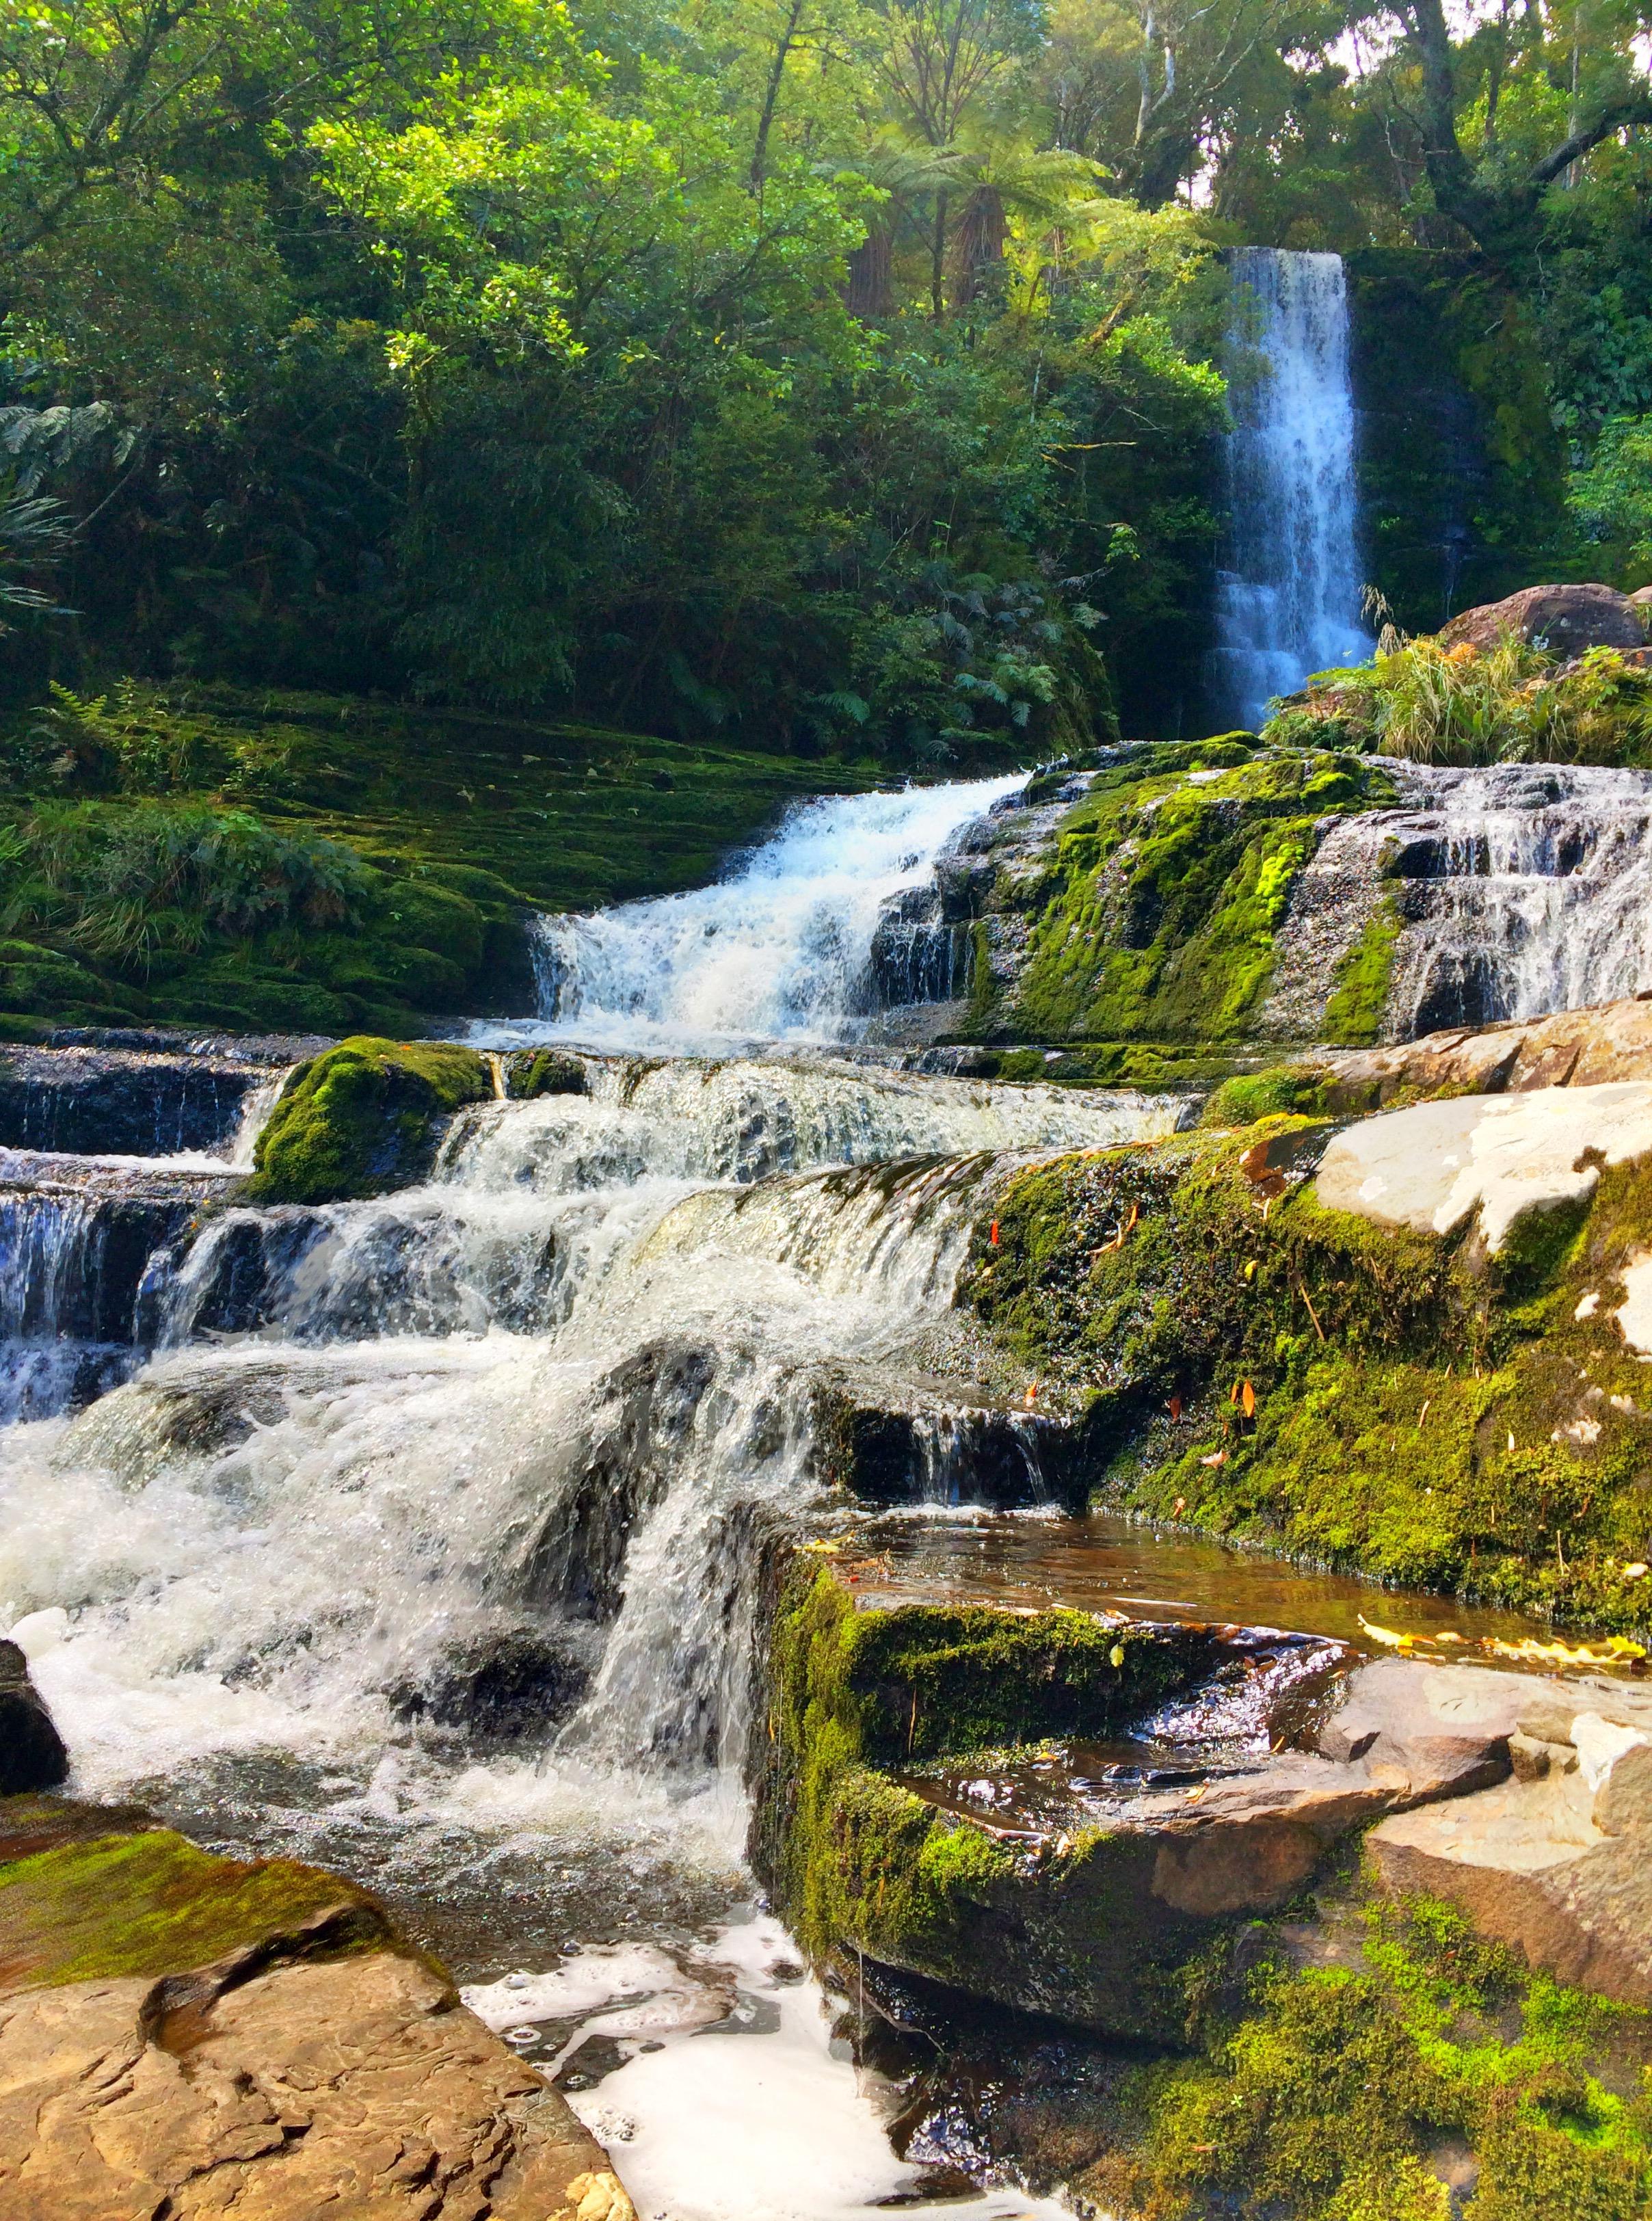 mclean falls, waterfalls of new zealand, south island waterfalls, waterfalls in the catlins